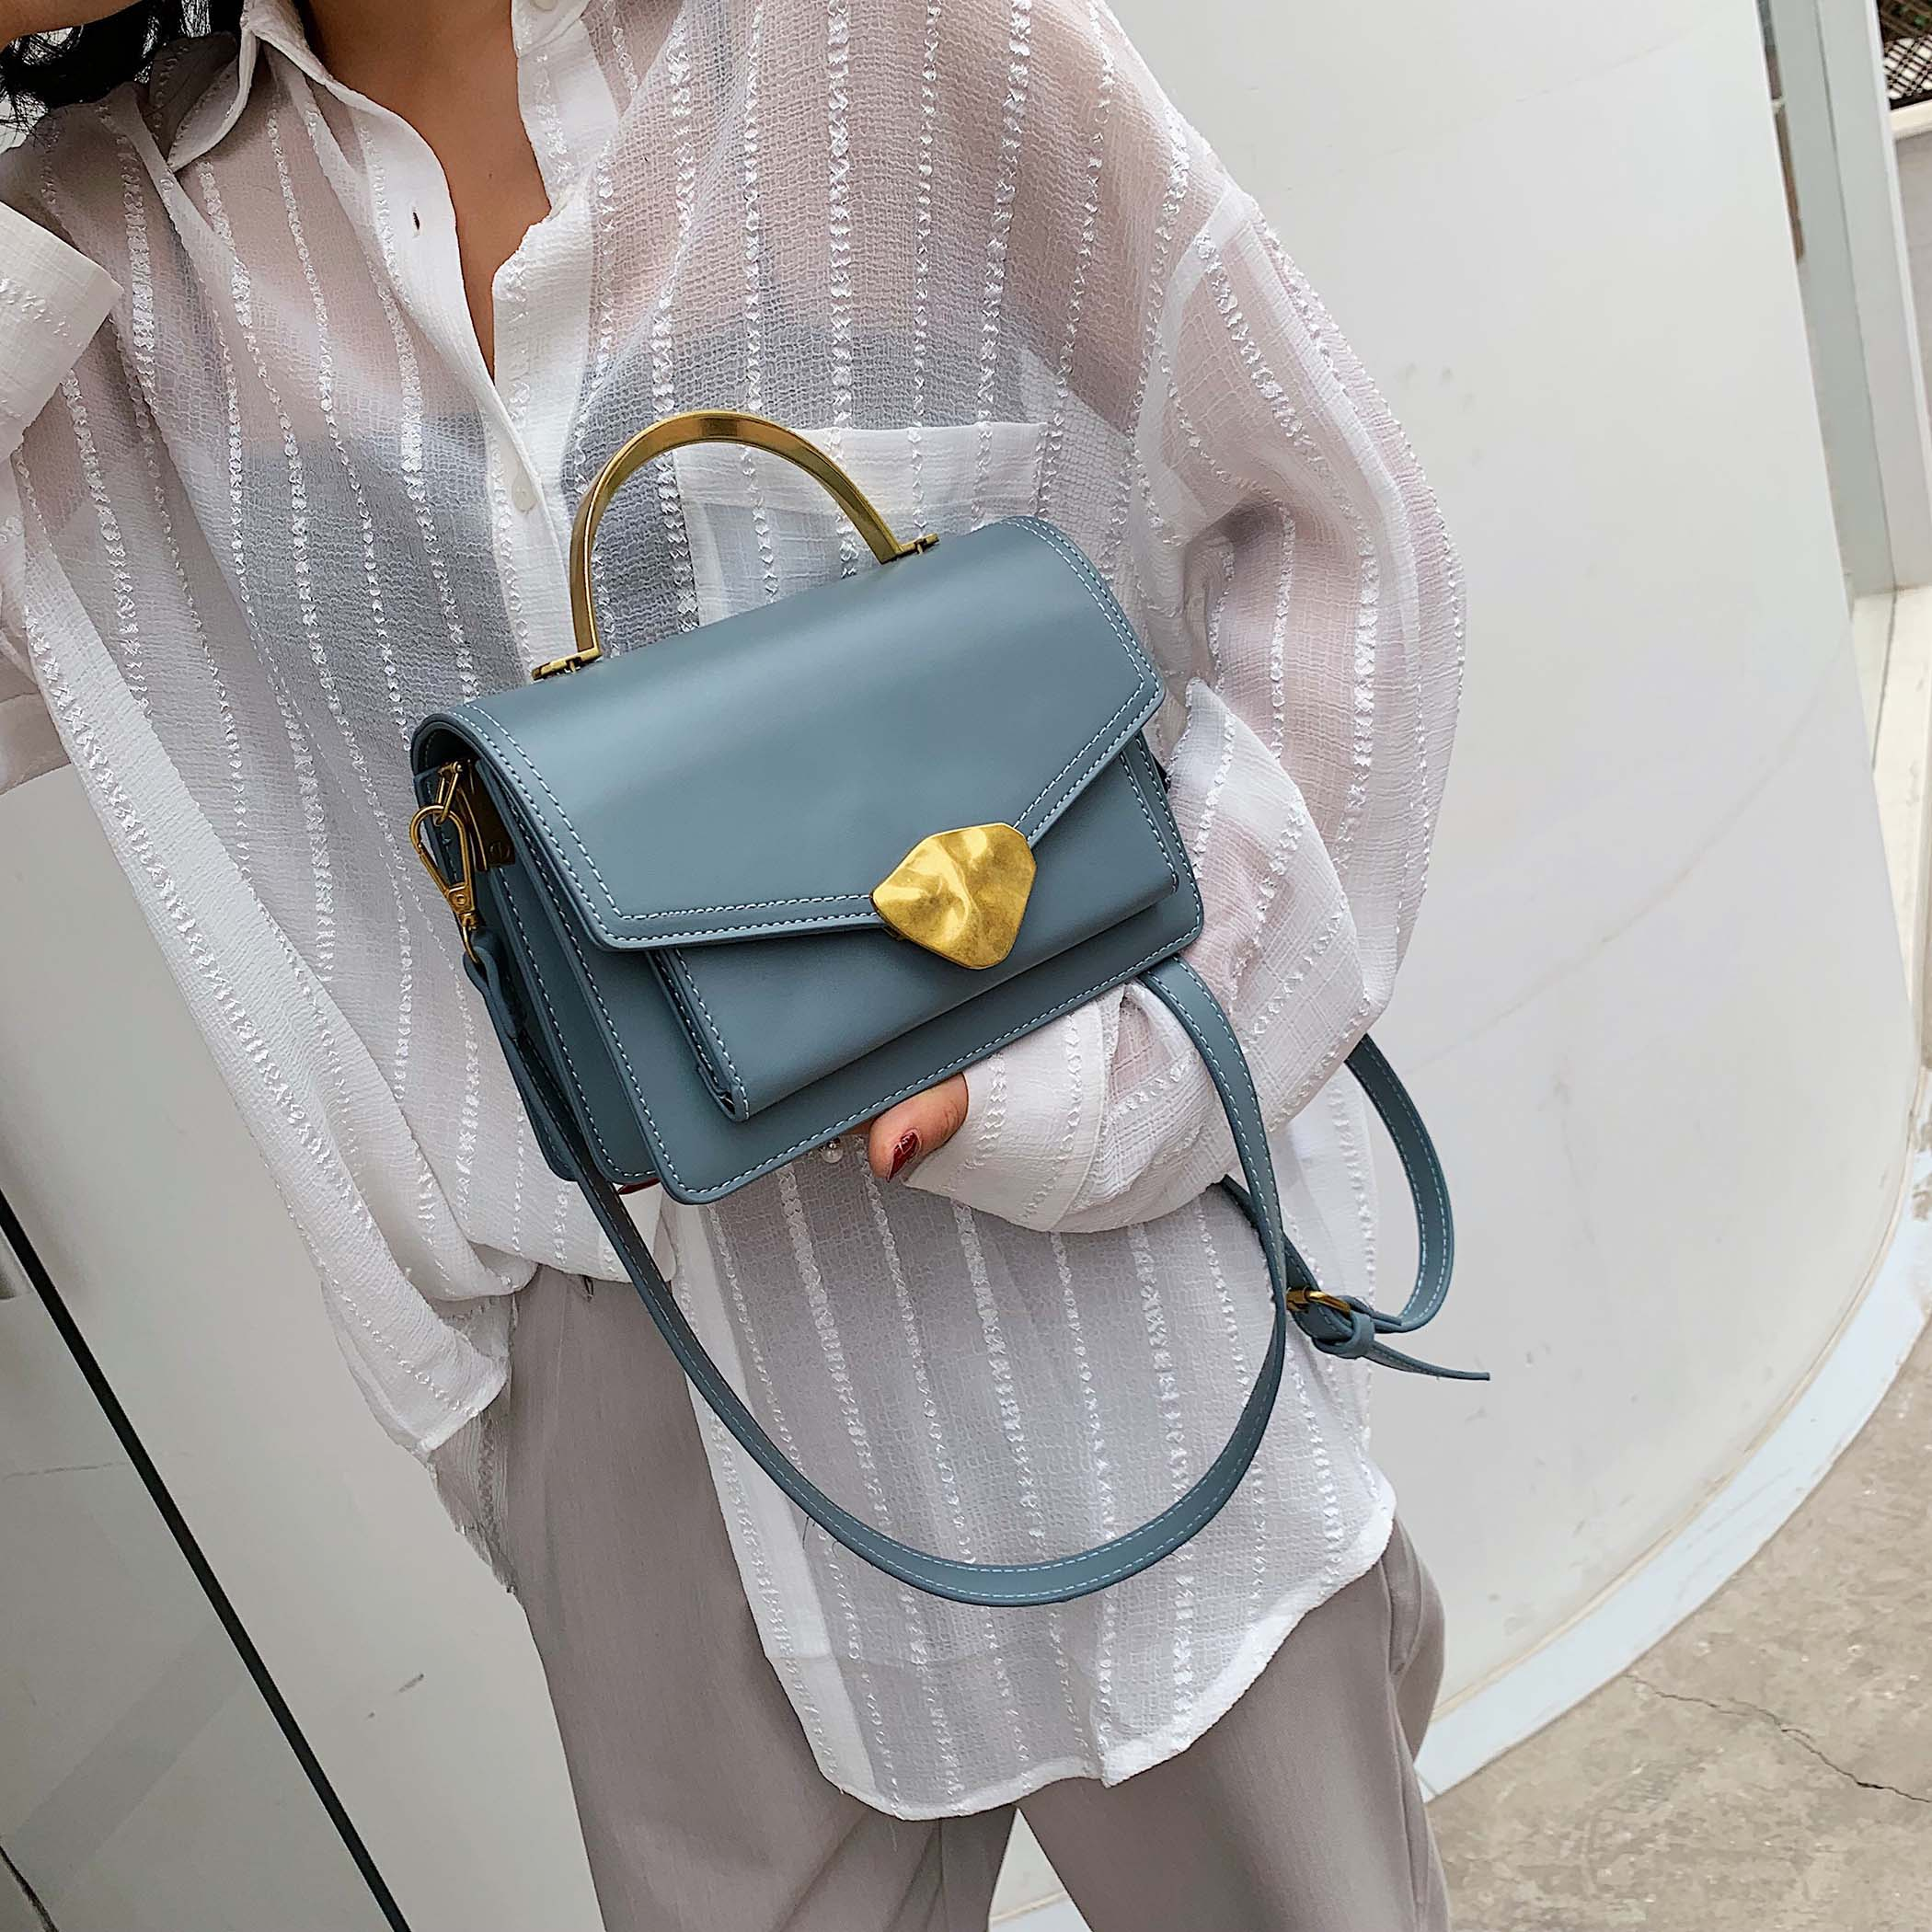 Image 2 - Simply Style PU Leather Crossbody Bags For Women Shoulder Messenger Bag Handbag Mini Tote Hand Bag With Metal Handle-in Shoulder Bags from Luggage & Bags